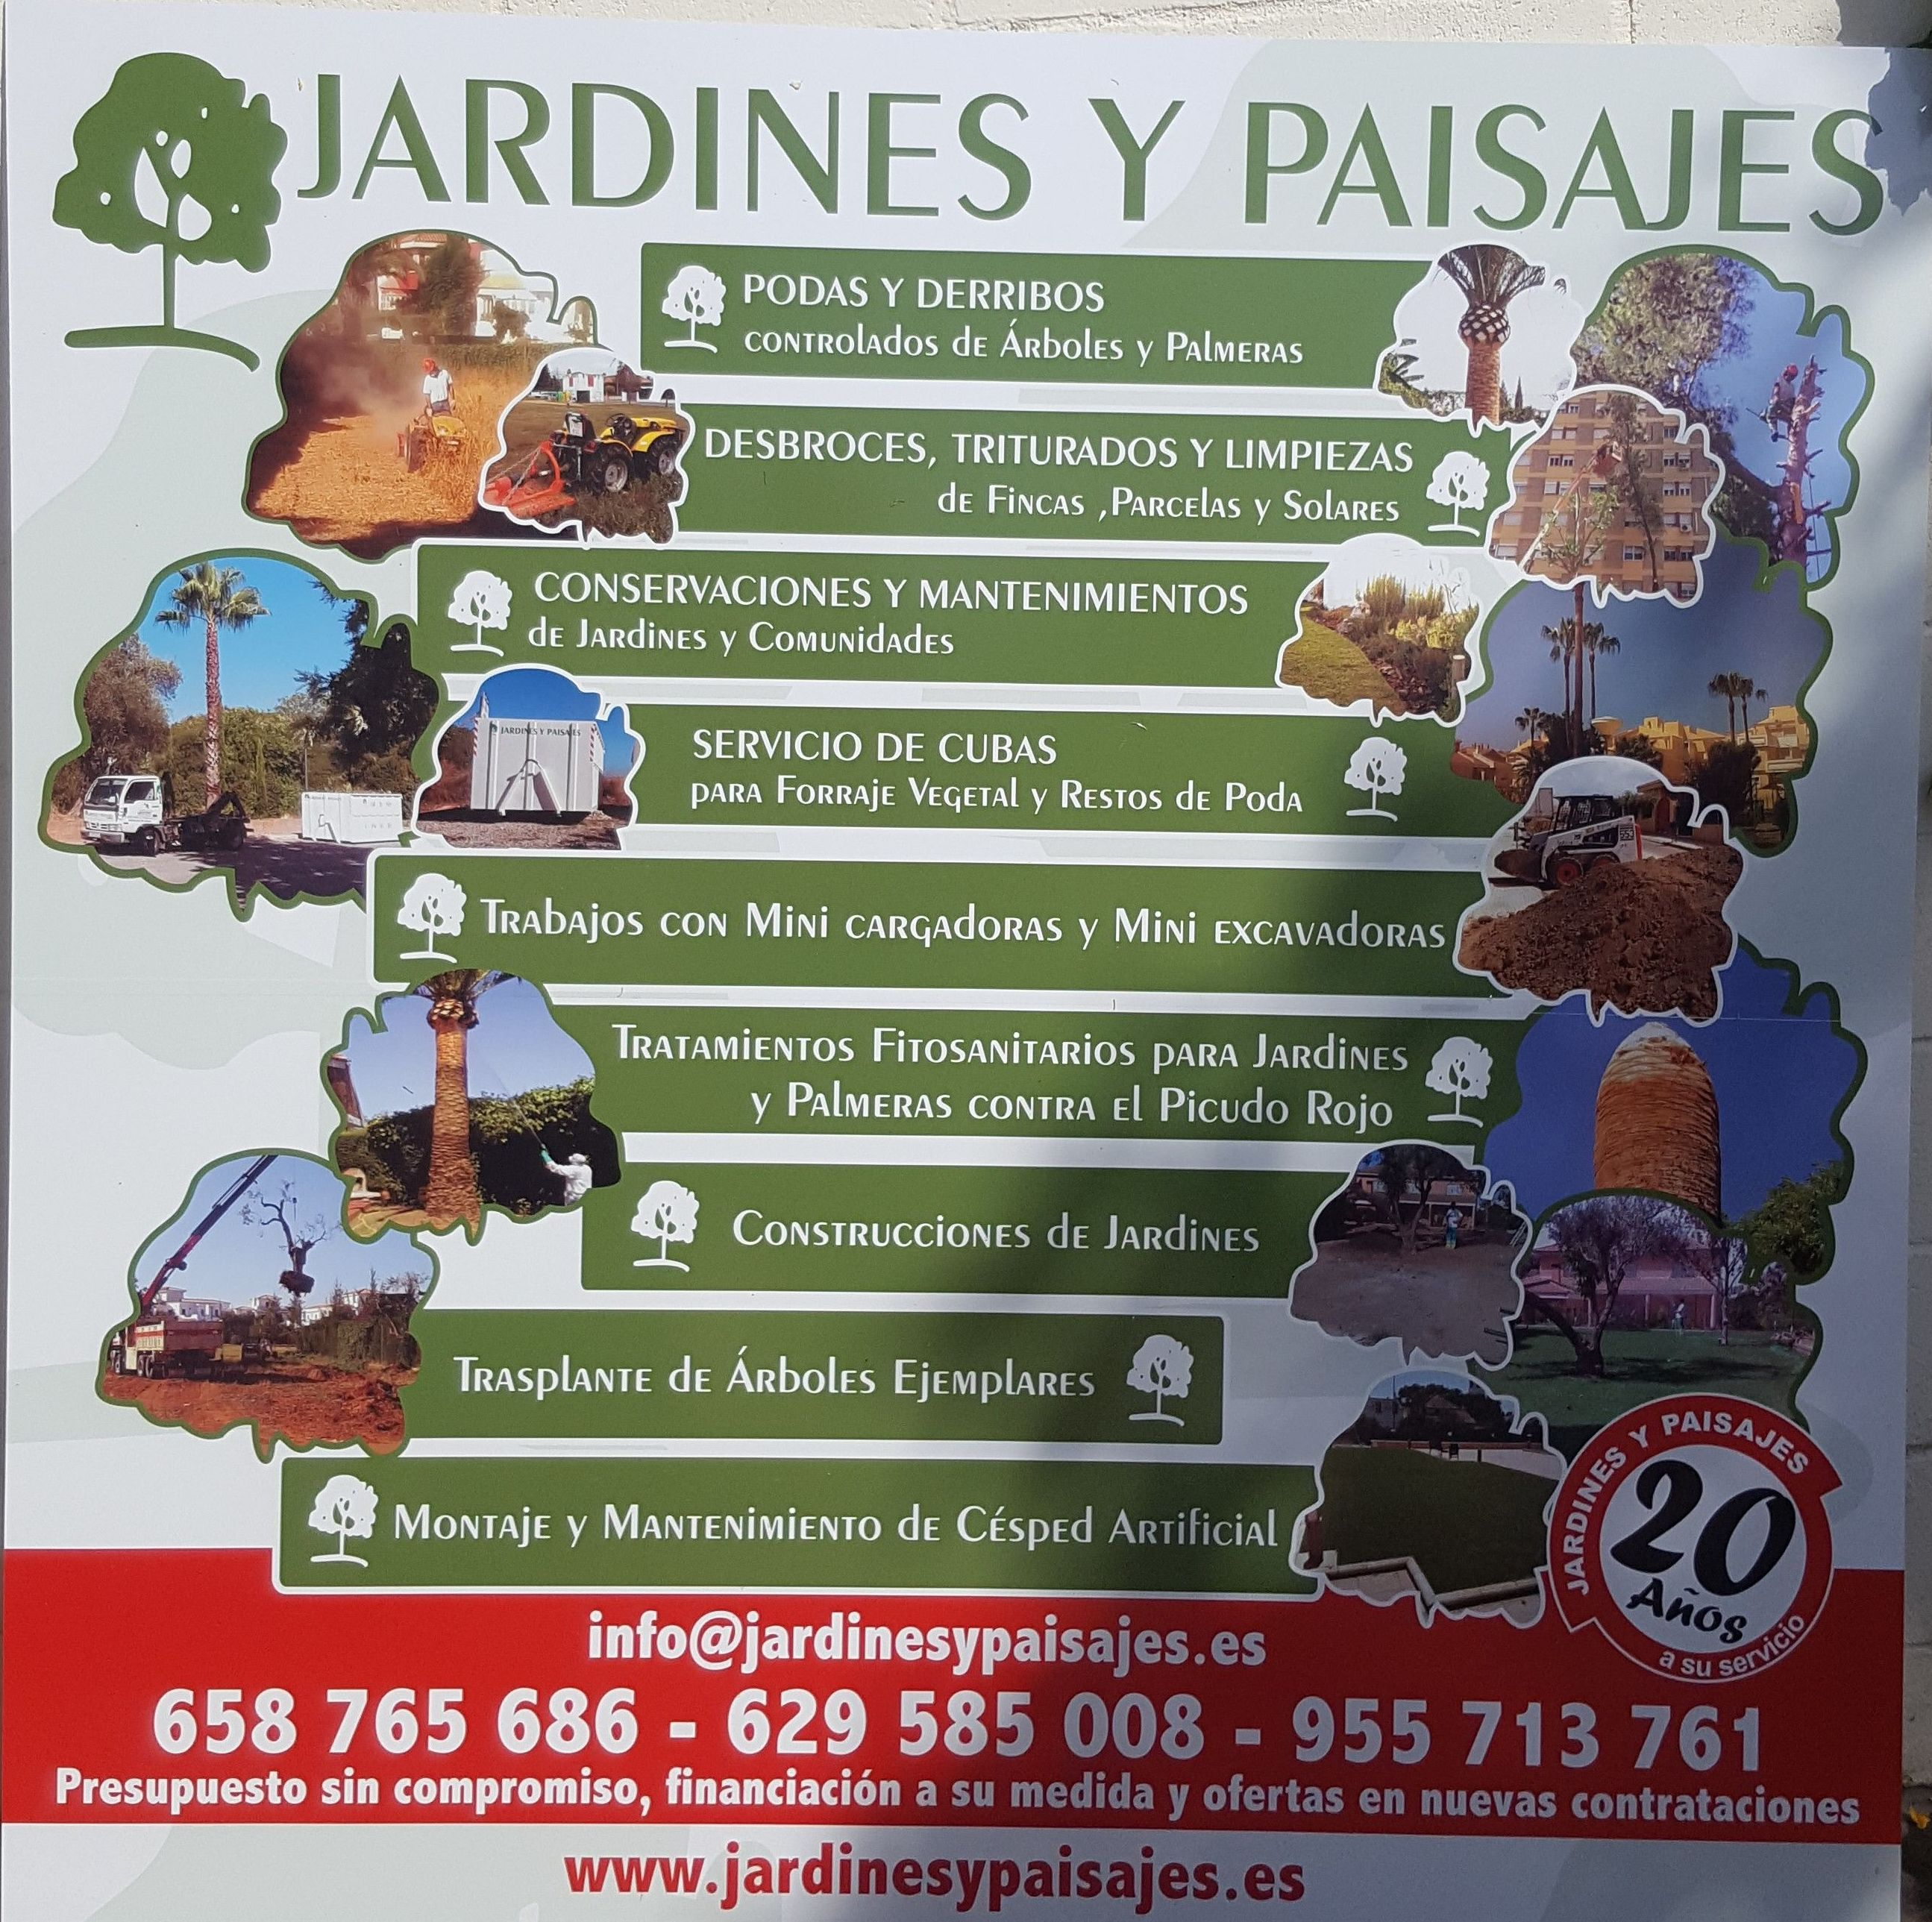 JARDINES Y PAISAJES